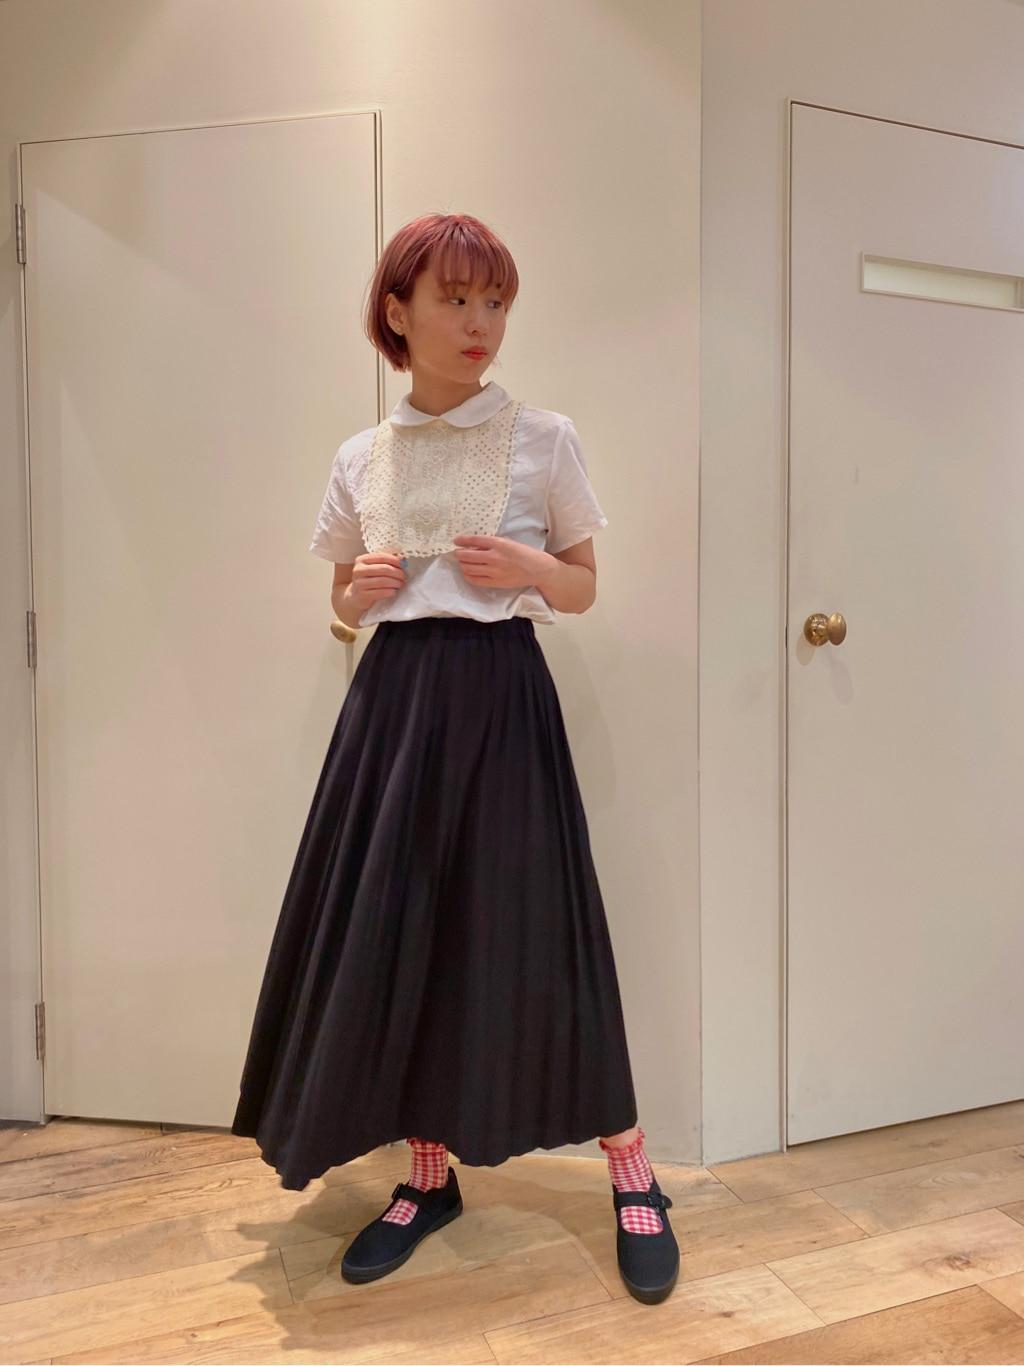 bulle de savon 新宿ミロード 身長:157cm 2020.07.03